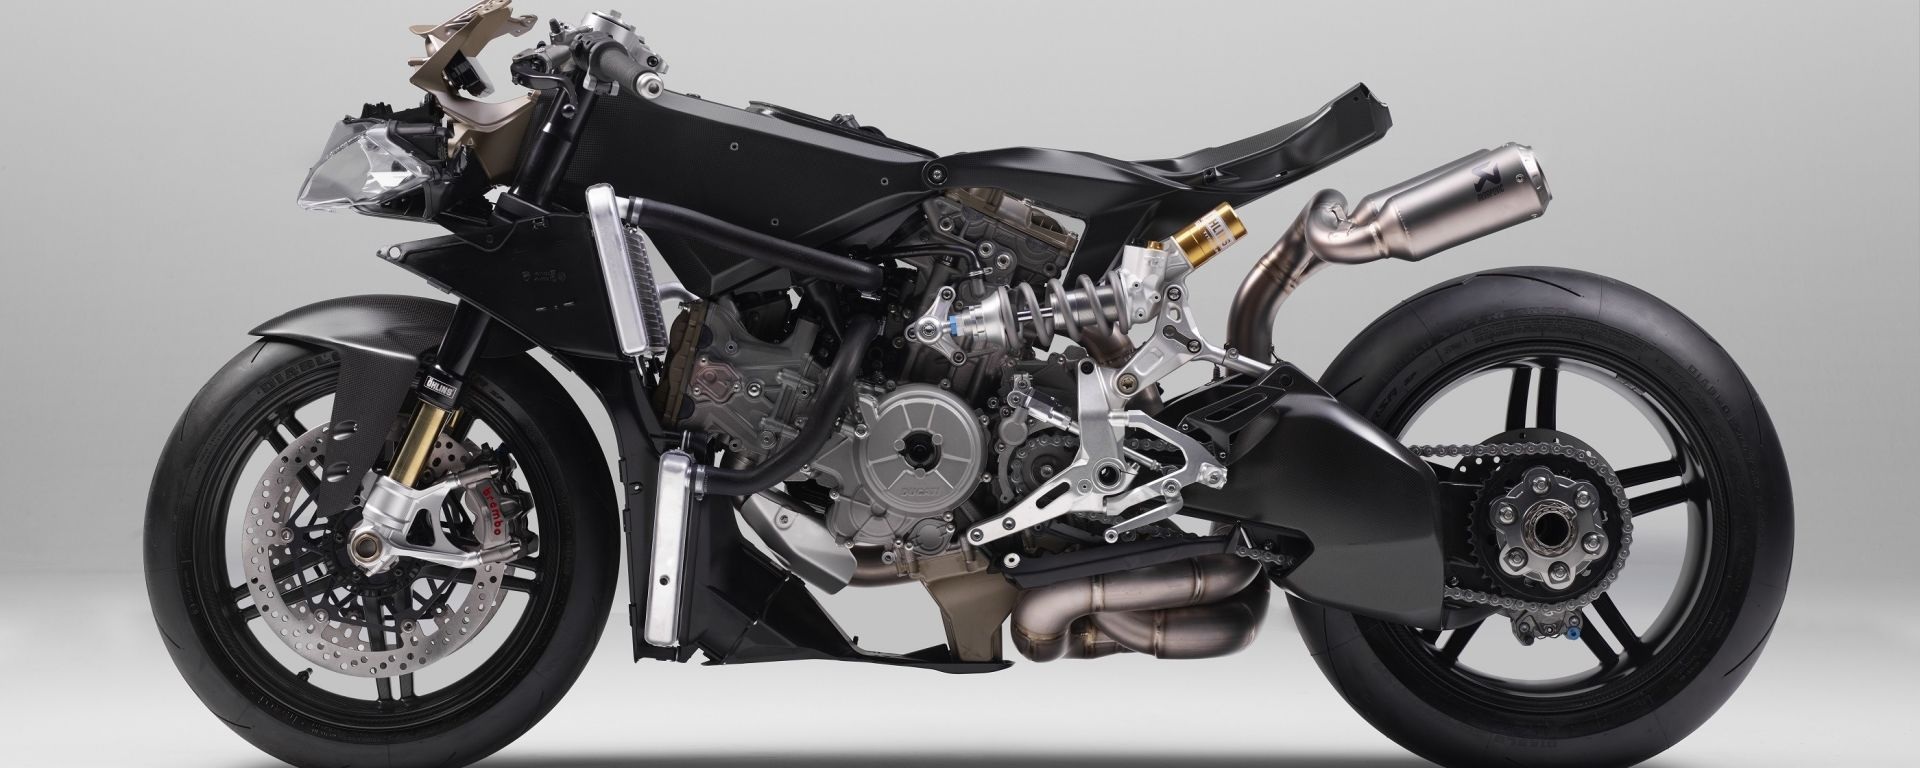 Ducati 1299 Superleggera, meccanica